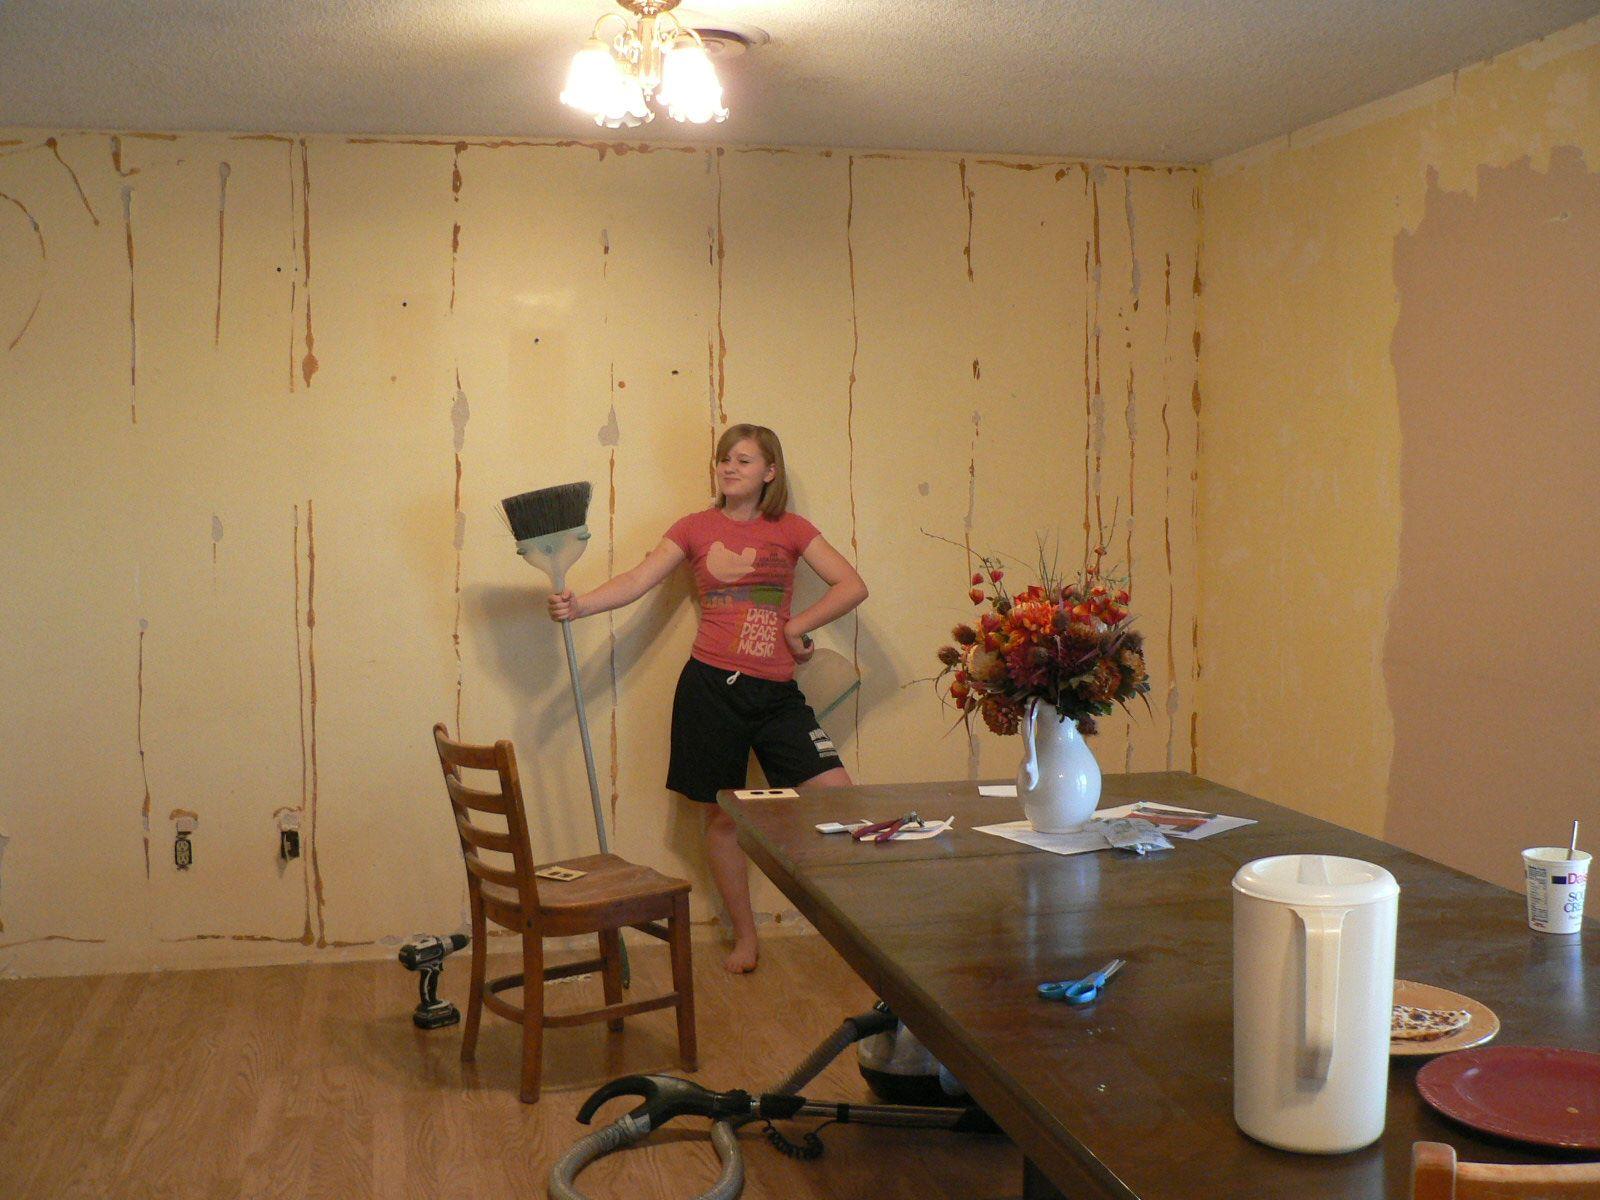 Wallpapering Over Wallpaper Backing - WallpaperSafari ...